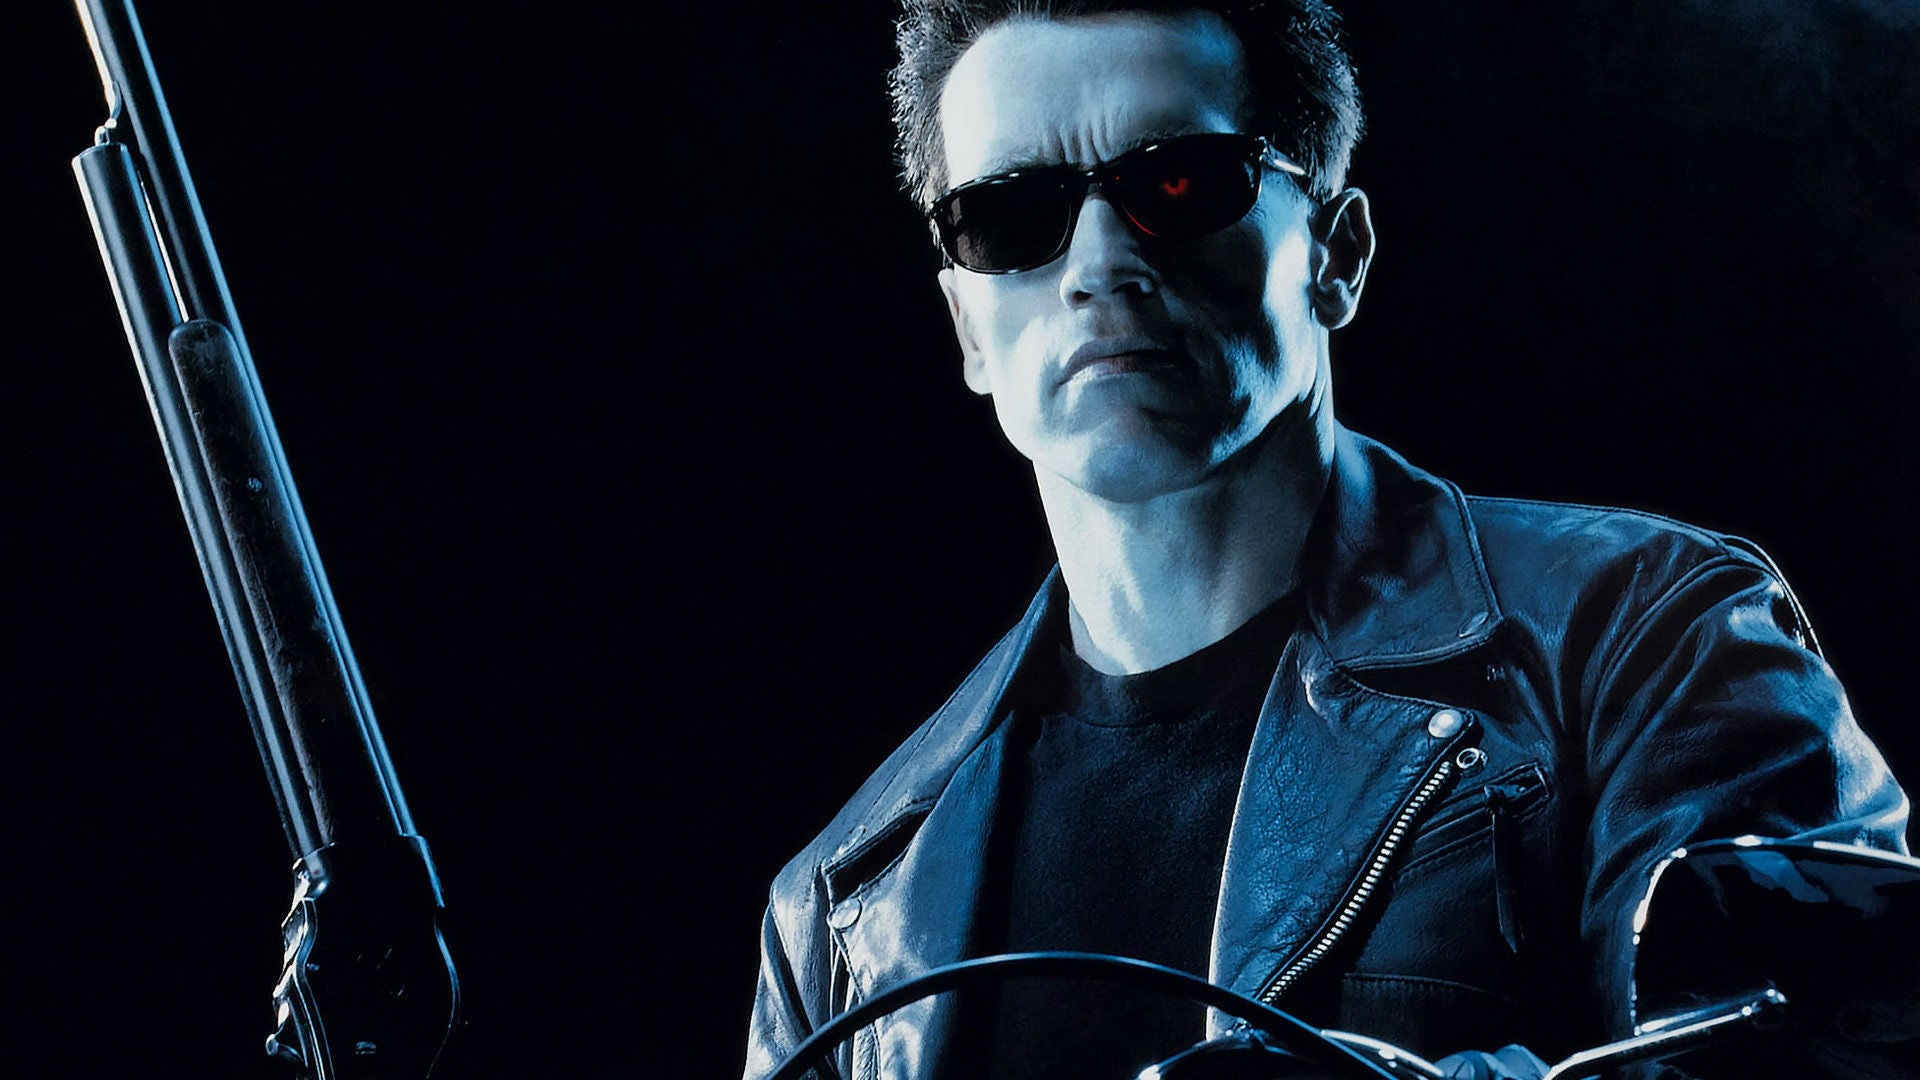 3d-movies arnold-schwarzenegger io9 james-cameron movies terminator-2-judgement-day